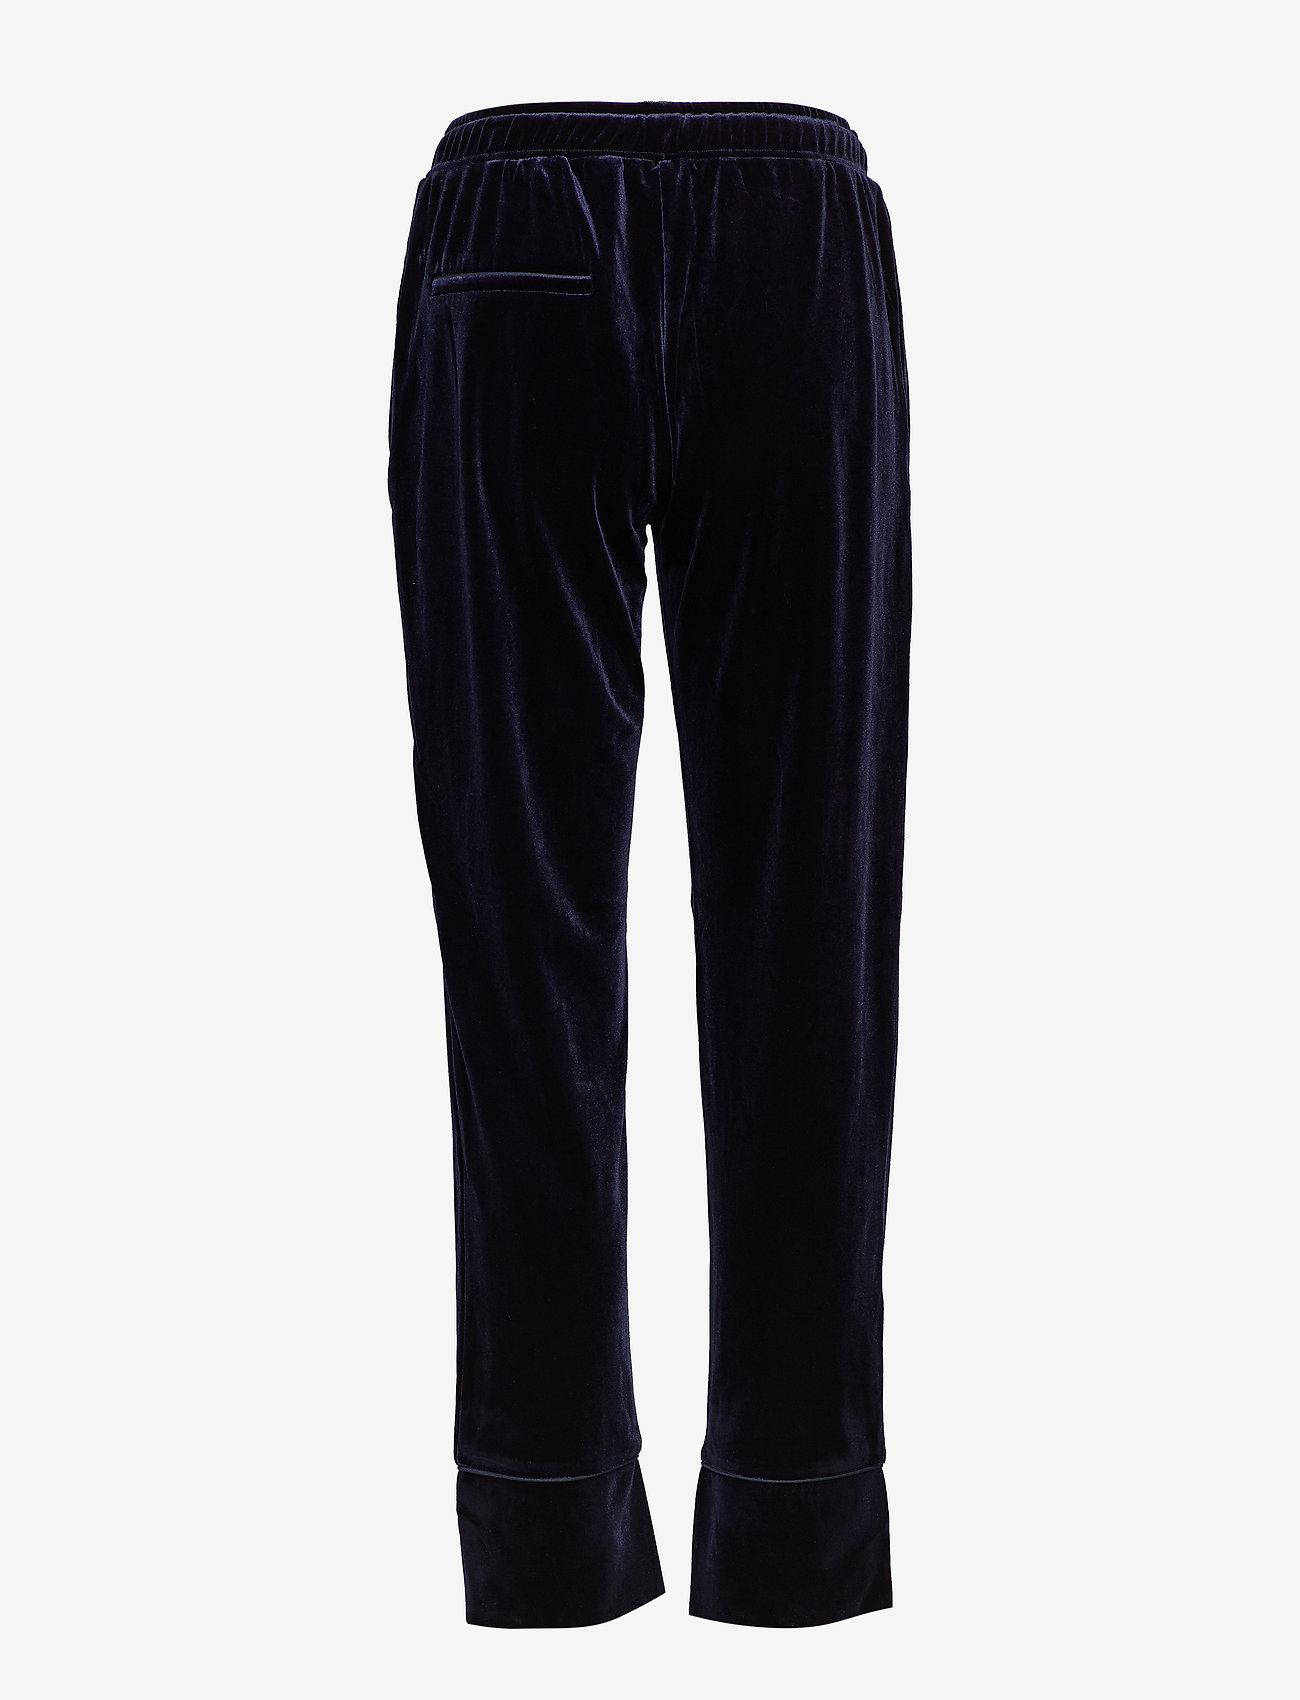 Sofie Schnoor - Pants - wide leg trousers - d.blue - 1